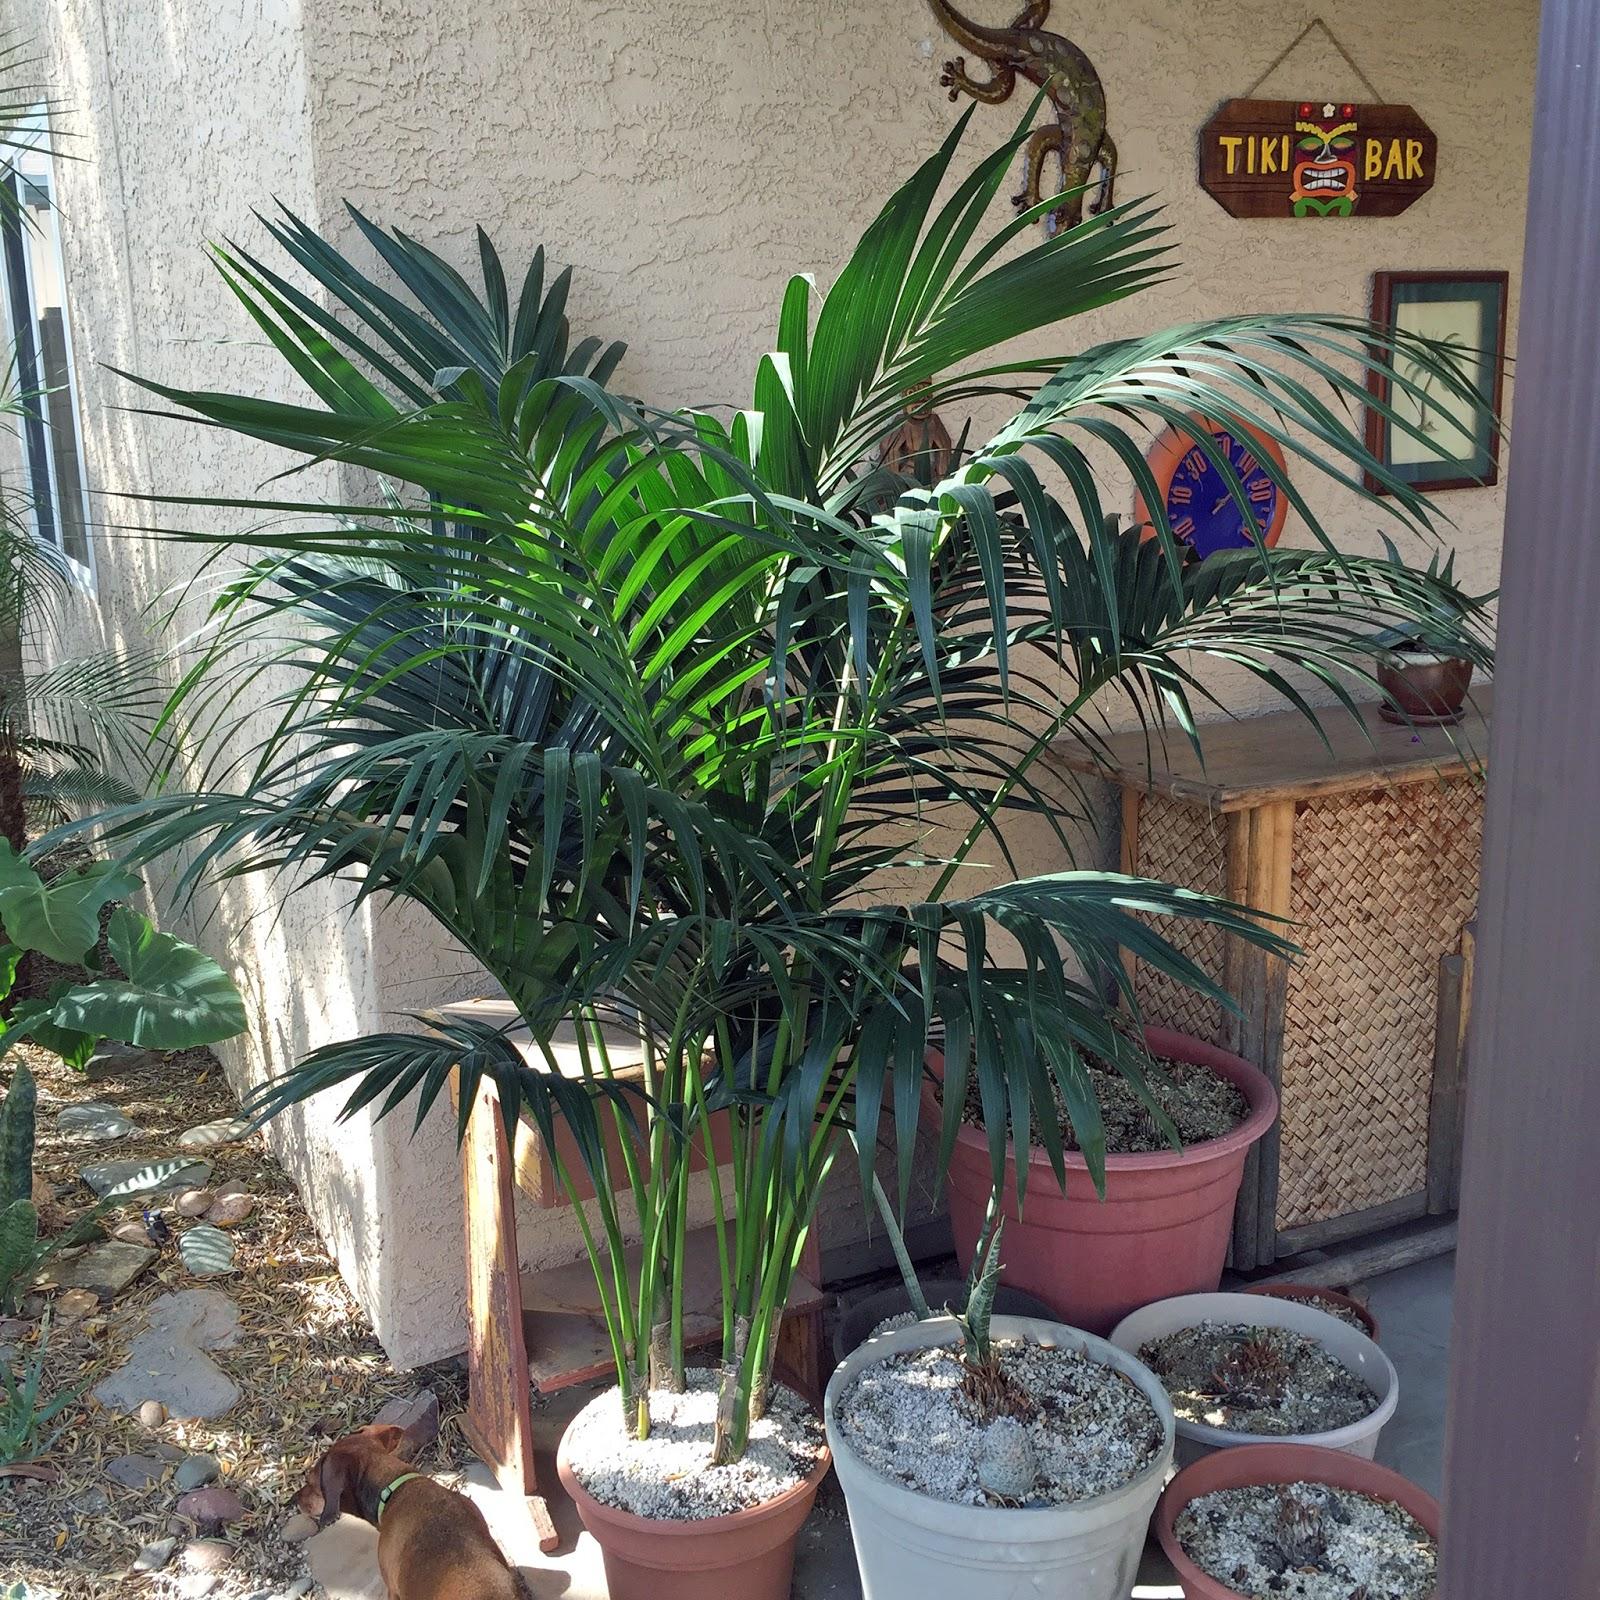 Brad's Tropical Paradise: Growing a Kentia palm outdoors ...